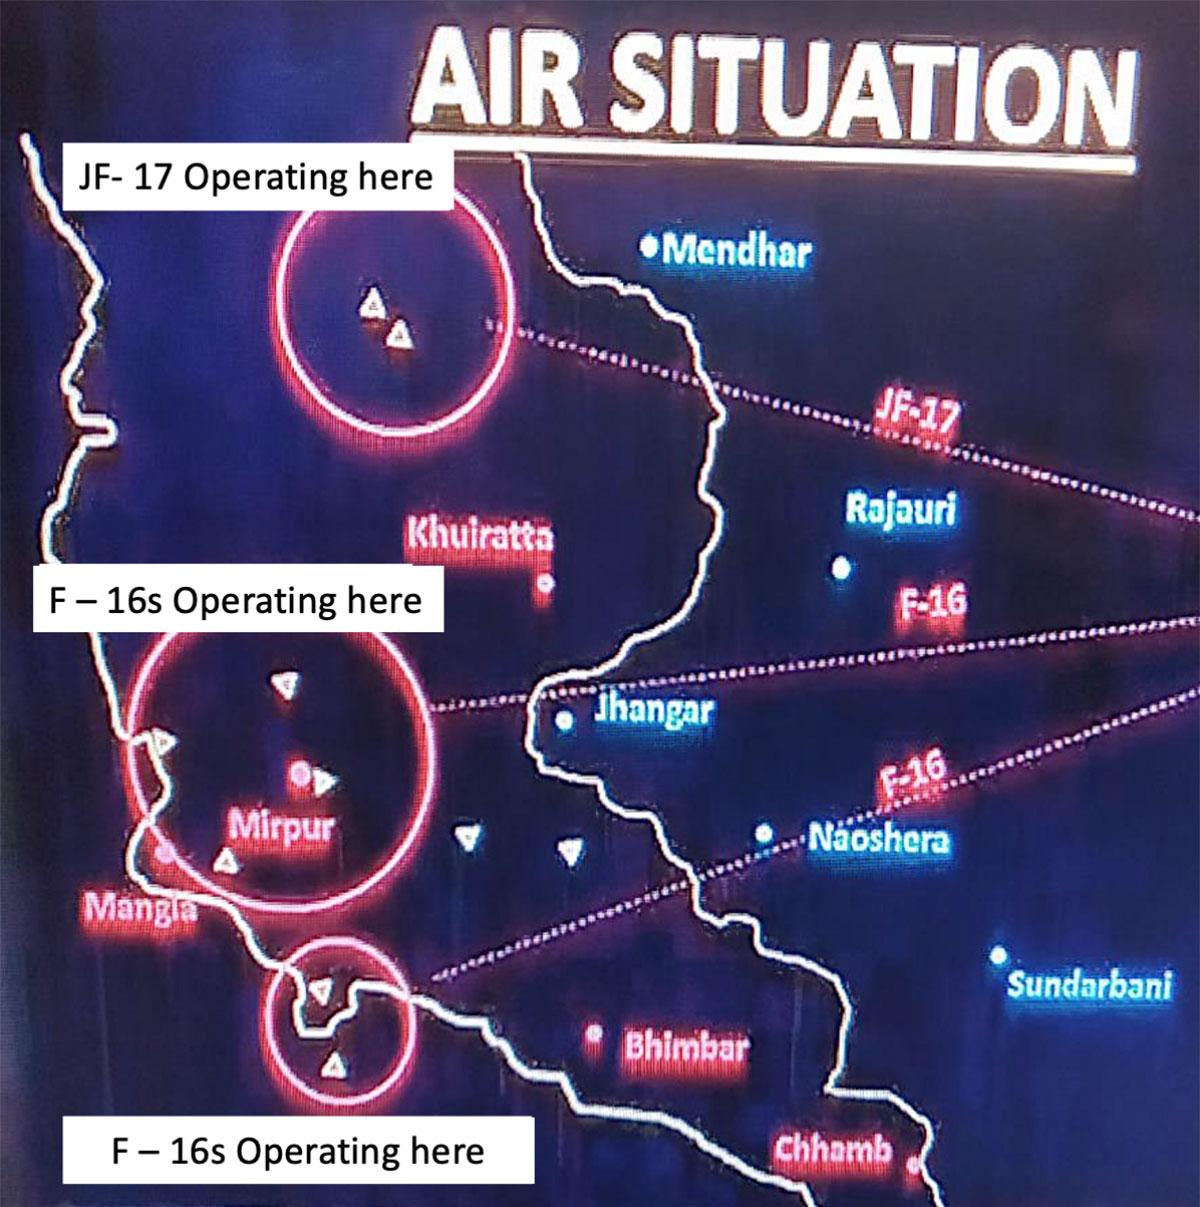 Using Open Source Intelligence (OSINT) to show how IAF's Abhinandan shot down a Pakistani F-16 5